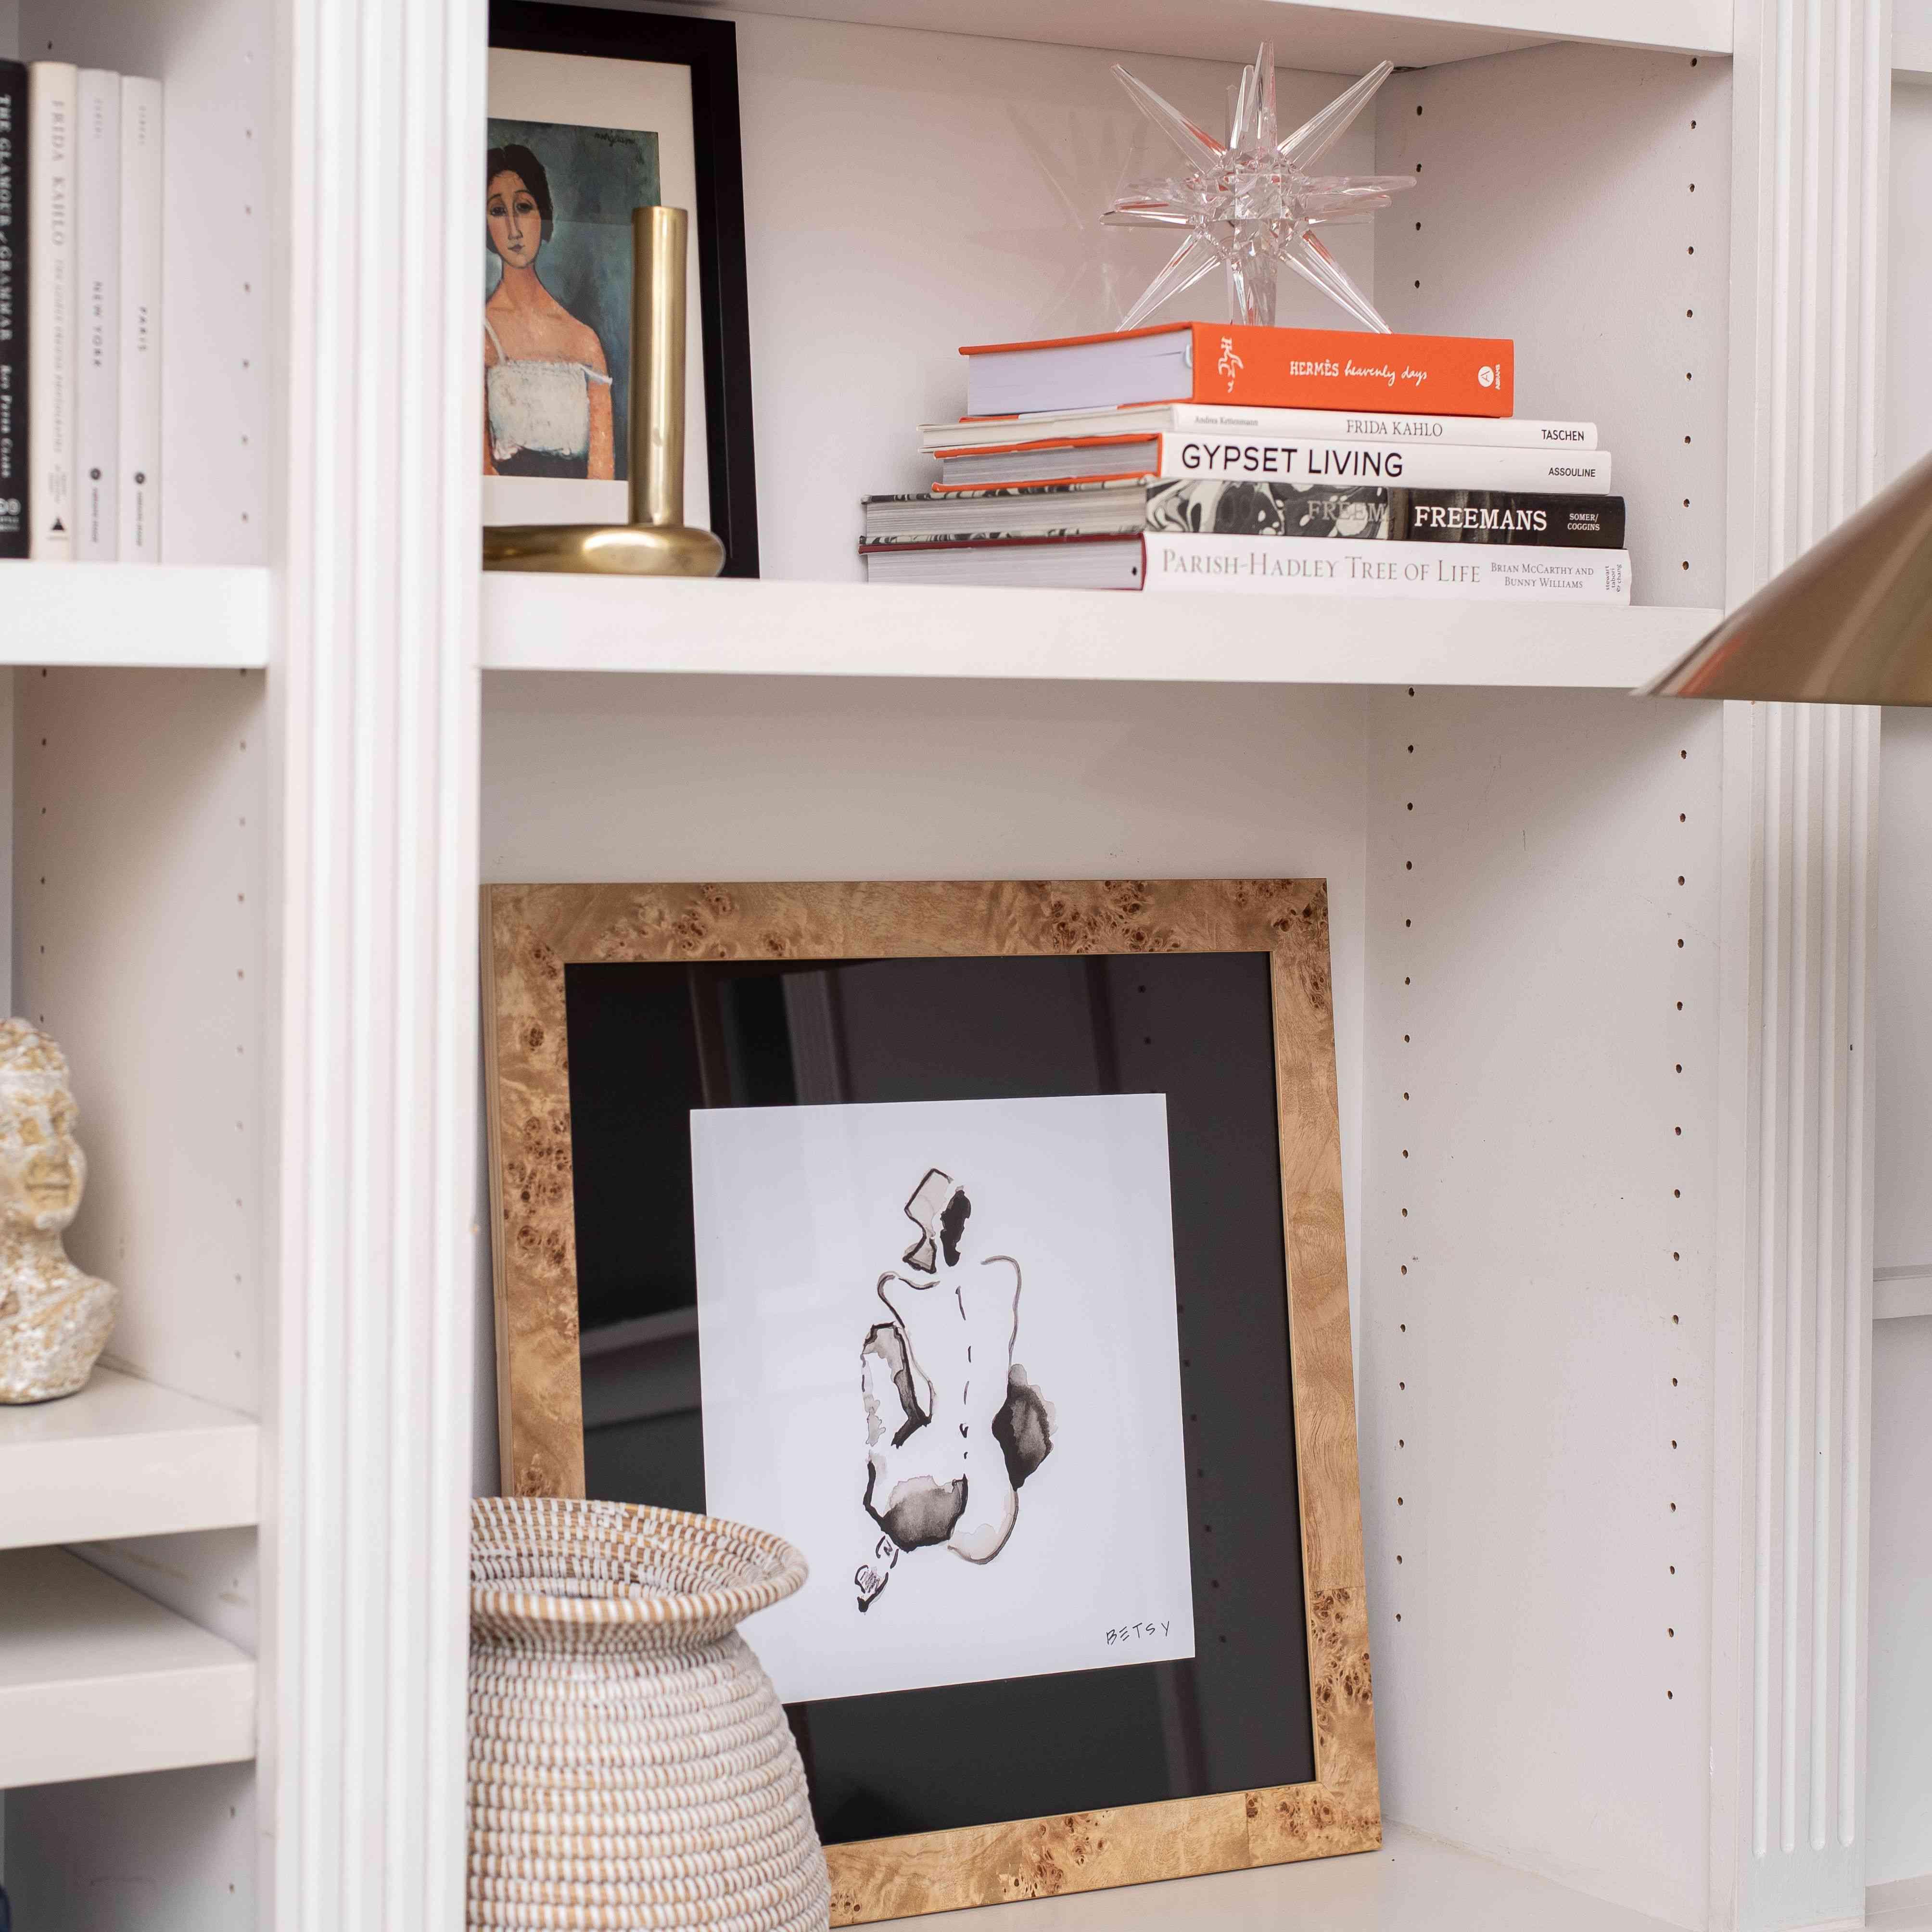 Burl wood frame on shelf.